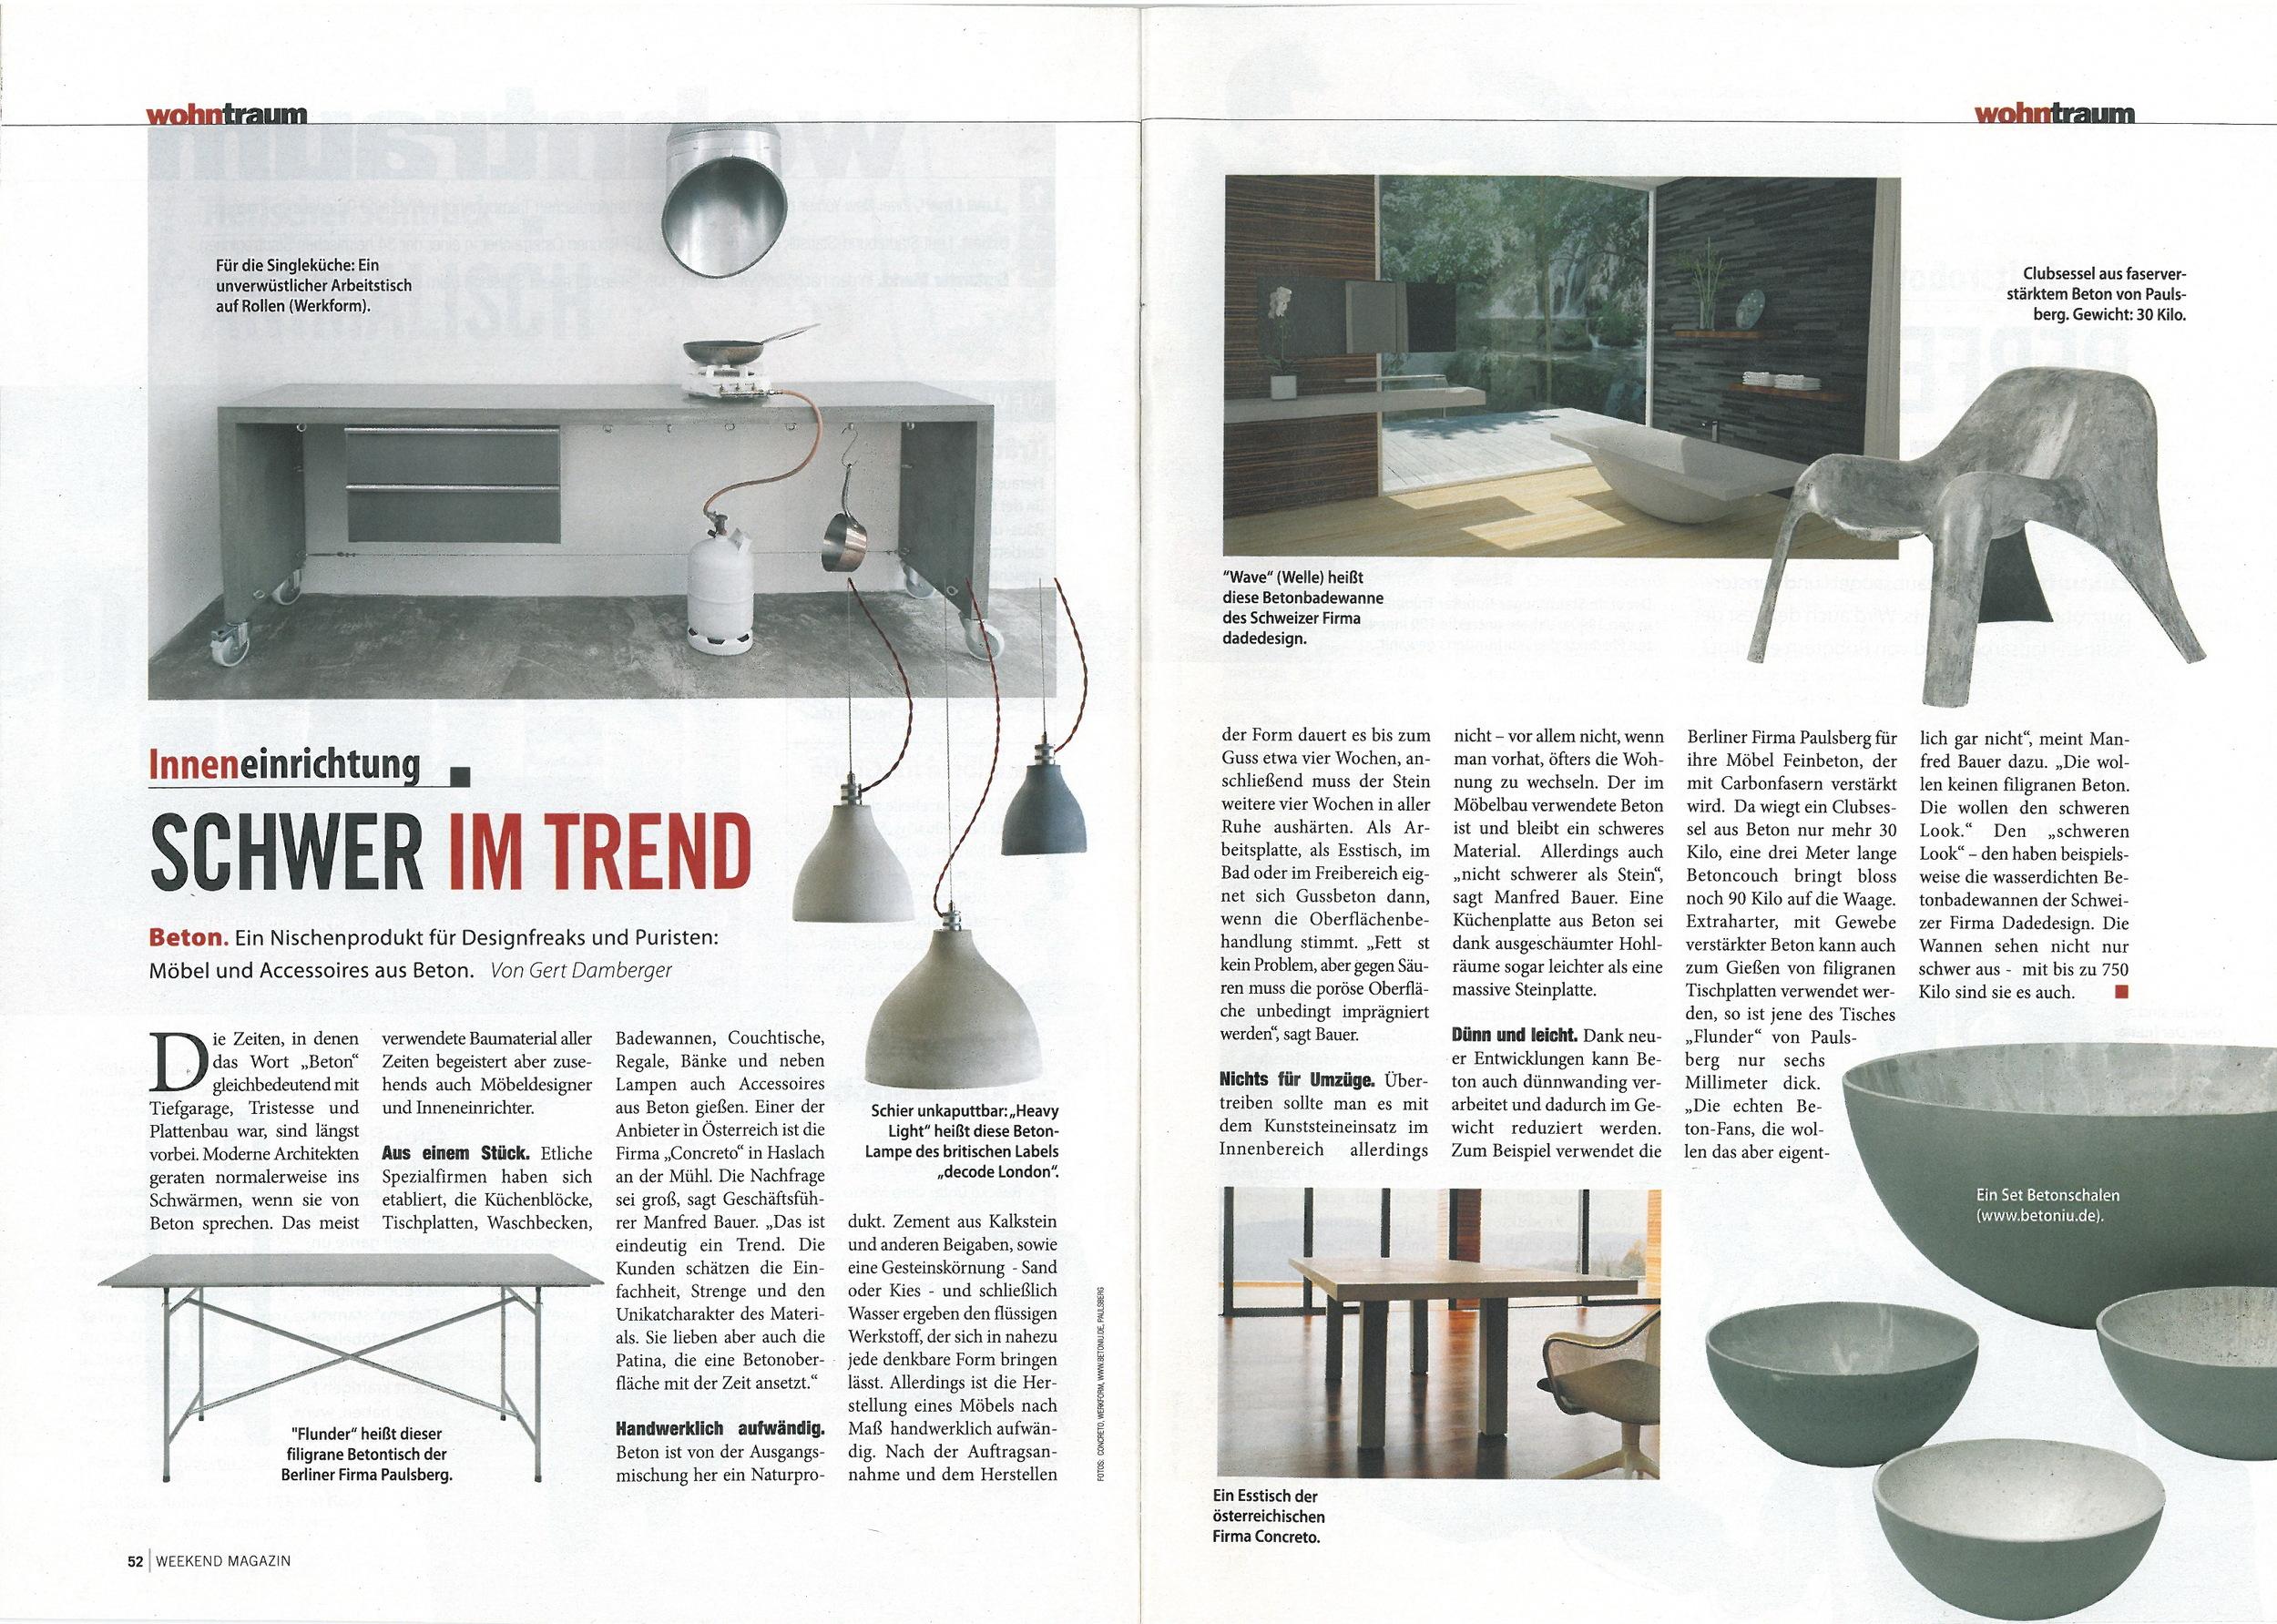 Weekend Magazin_6.Jul.2012_DadeDesign Wave_p52.jpg